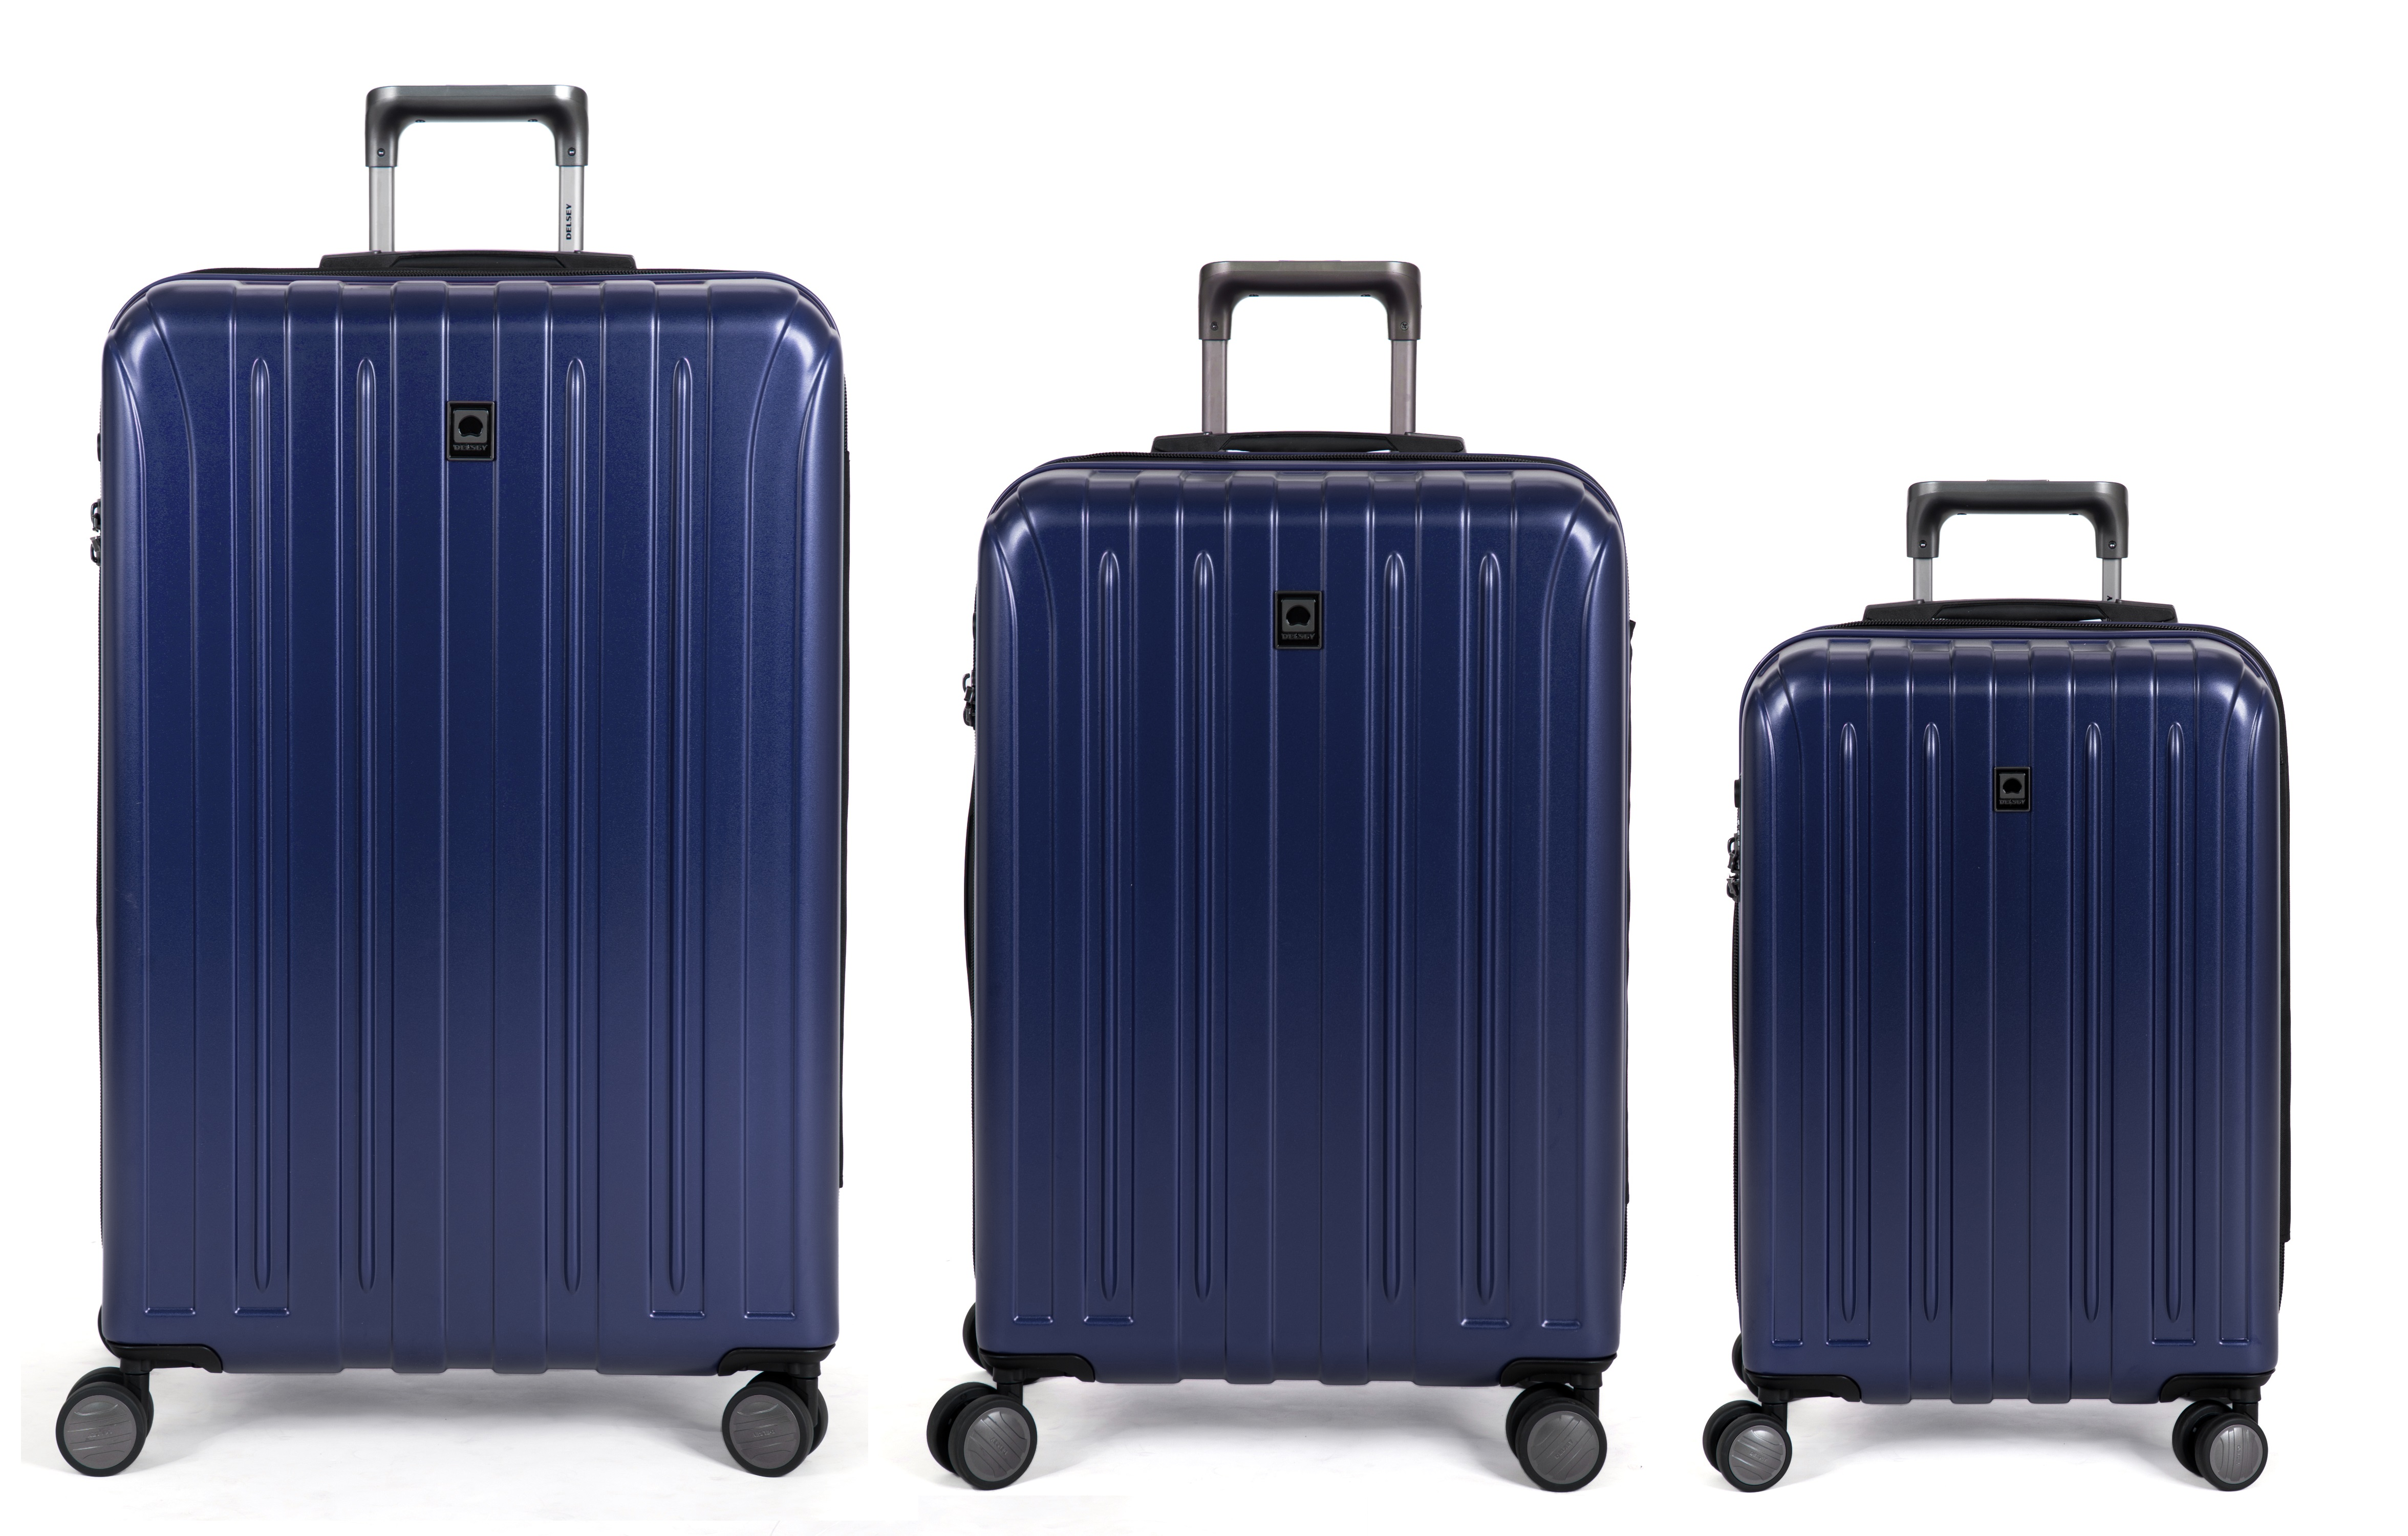 delsey luggage helium titanium hardside 3 piece luggage set 21 25 29 ebay. Black Bedroom Furniture Sets. Home Design Ideas